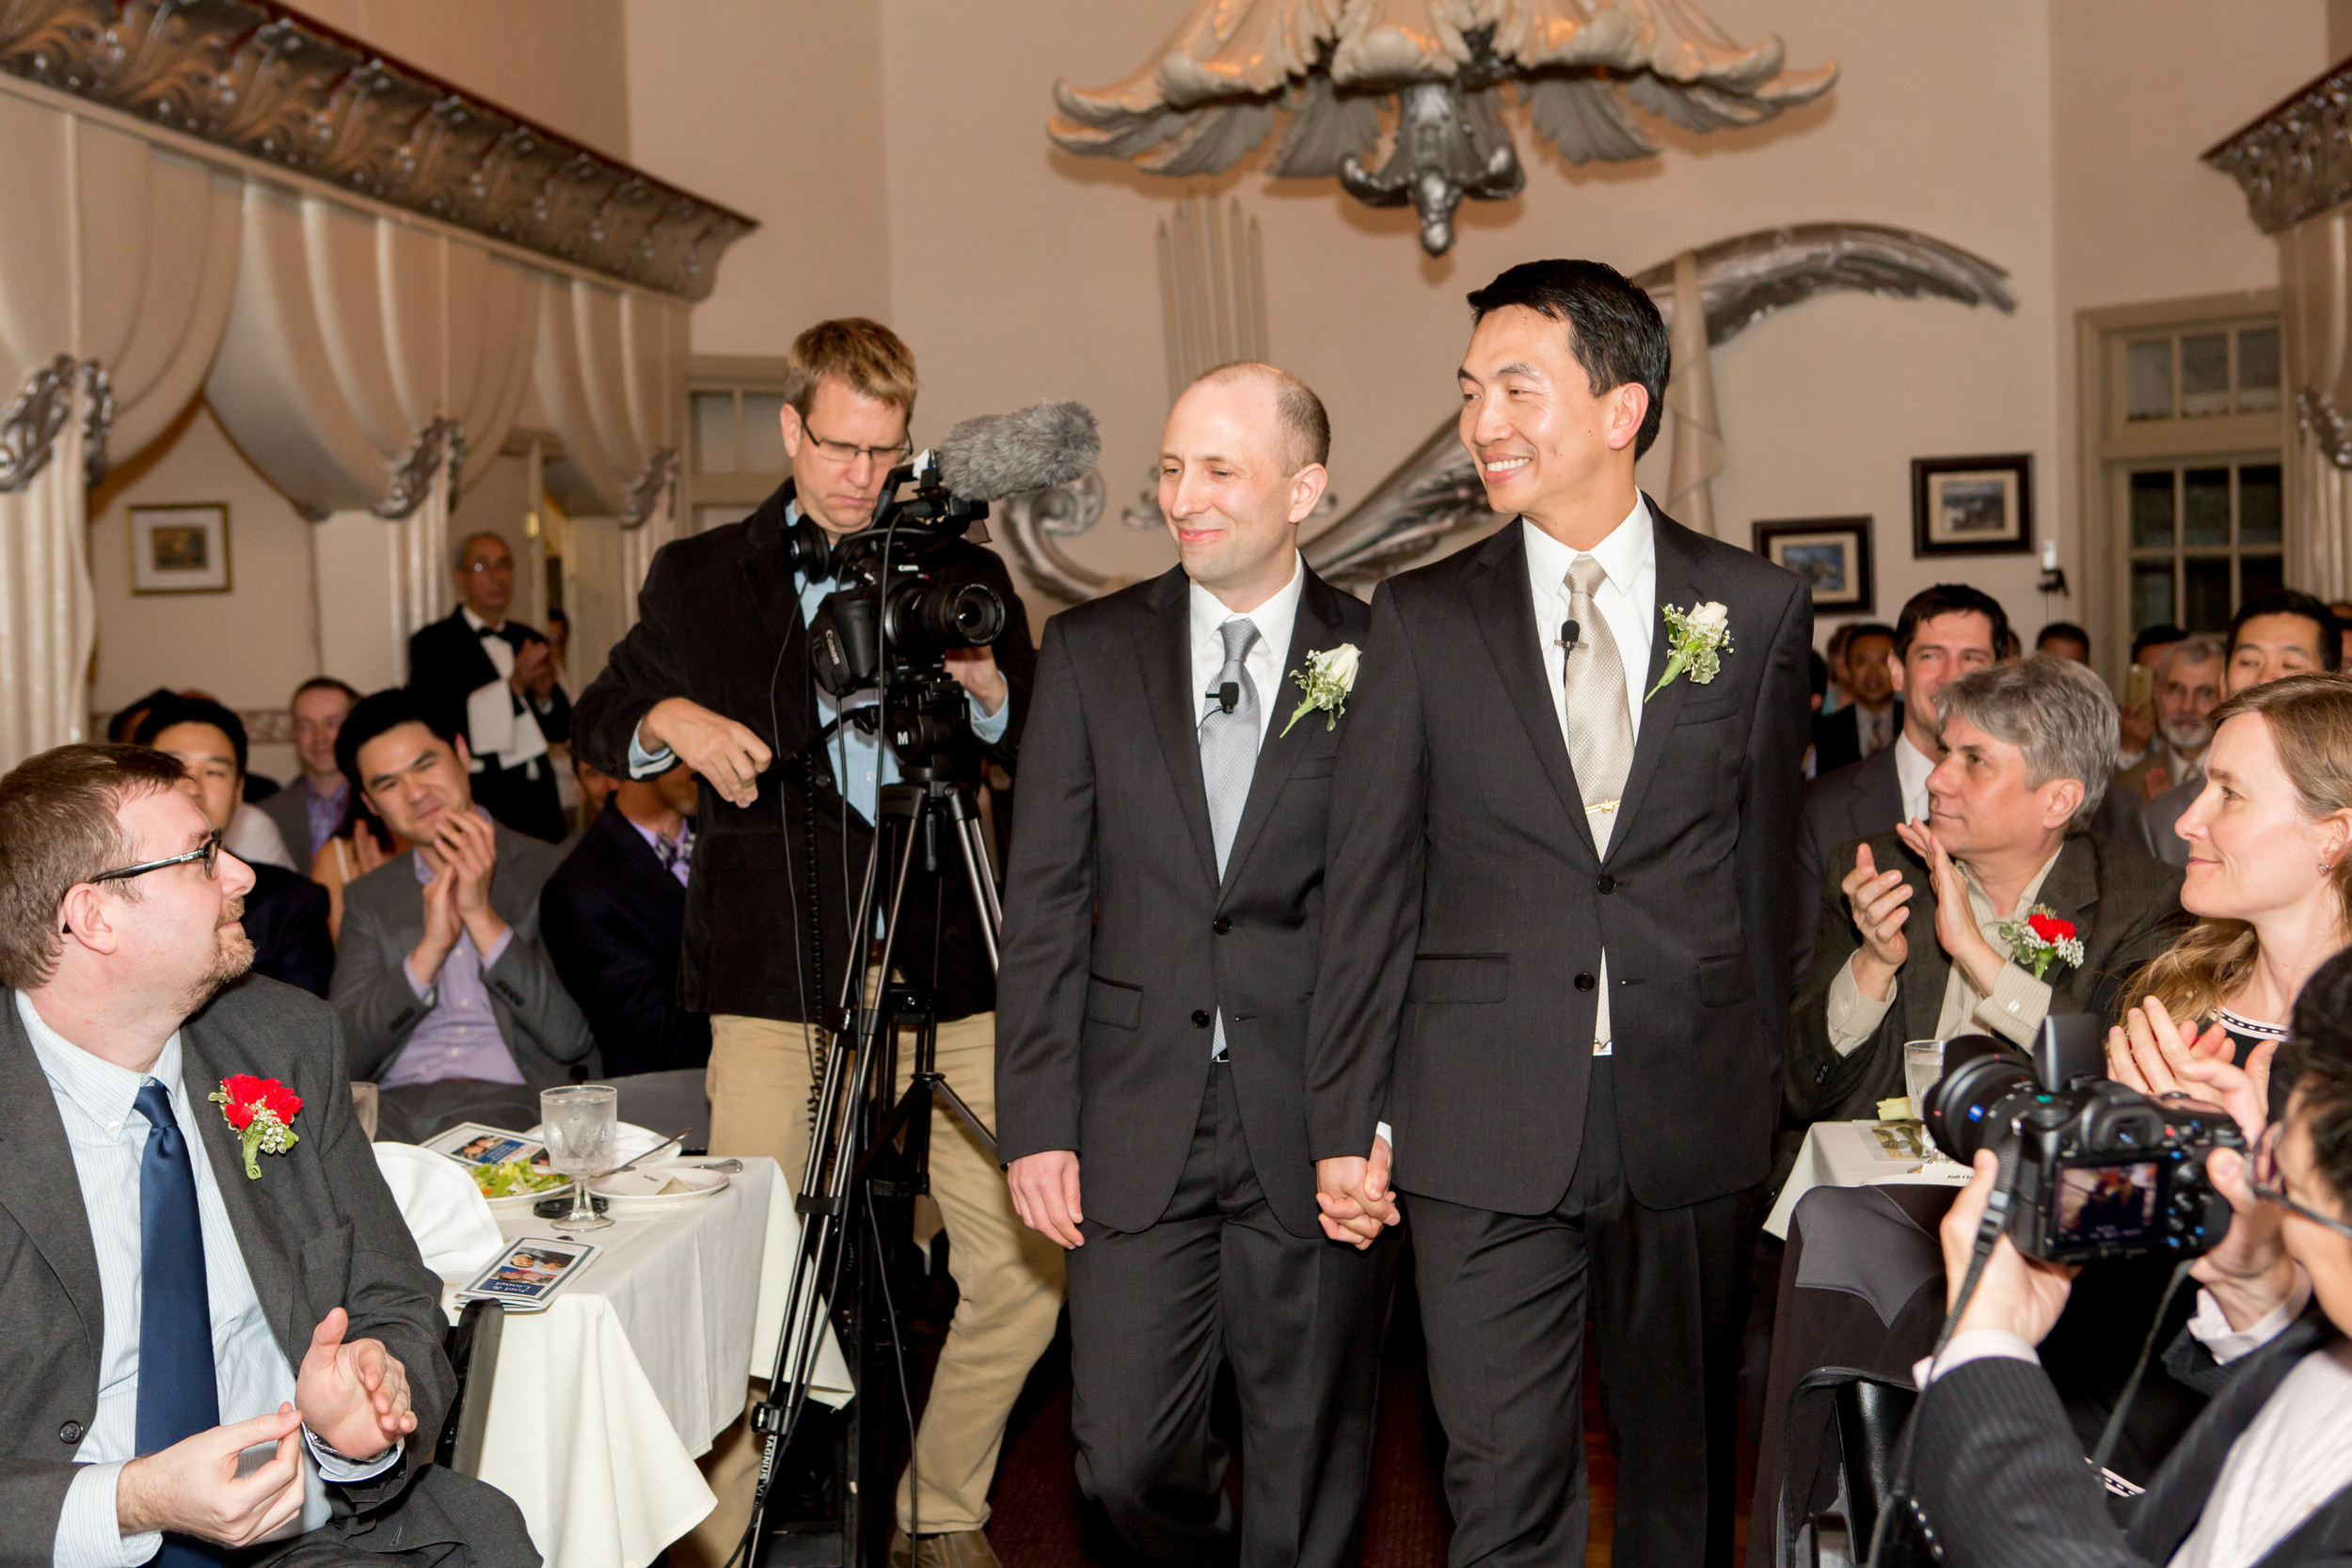 Joel Engardio and Lionel Hsu